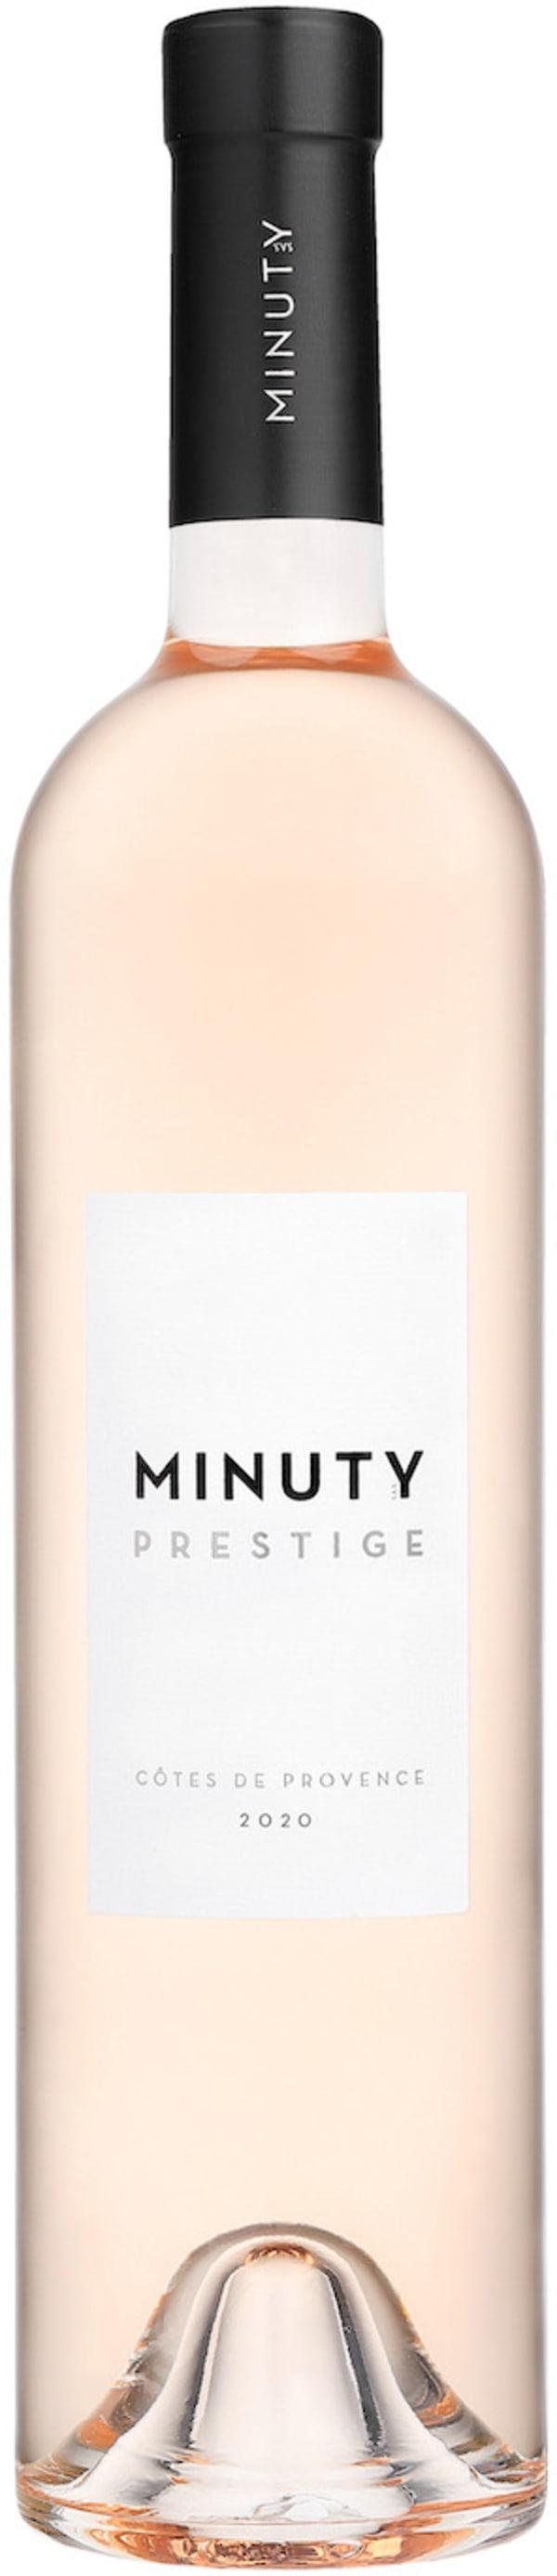 Minuty Prestige Rosé 2020